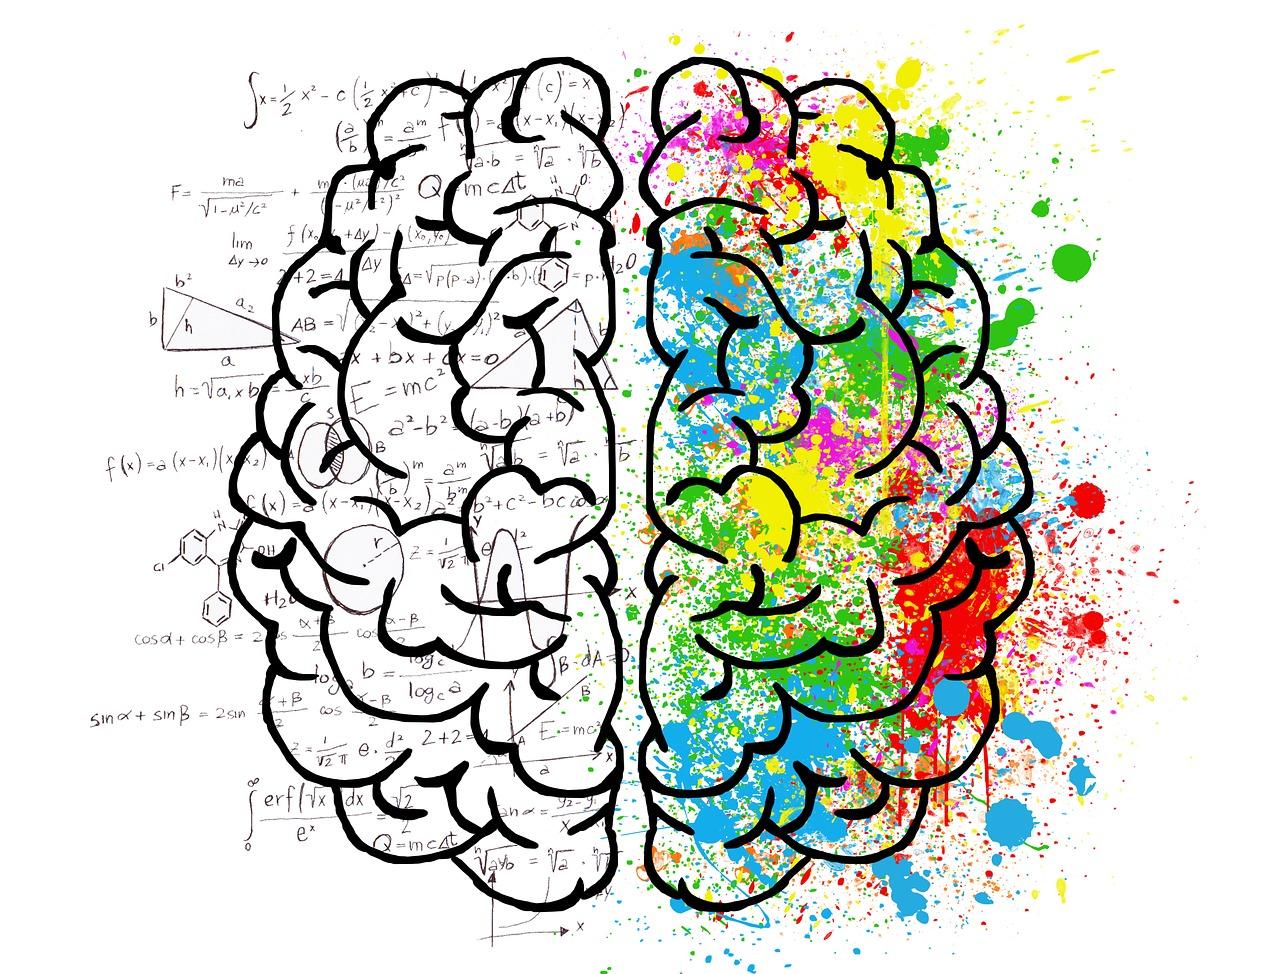 The keys to thwarting neuromythics